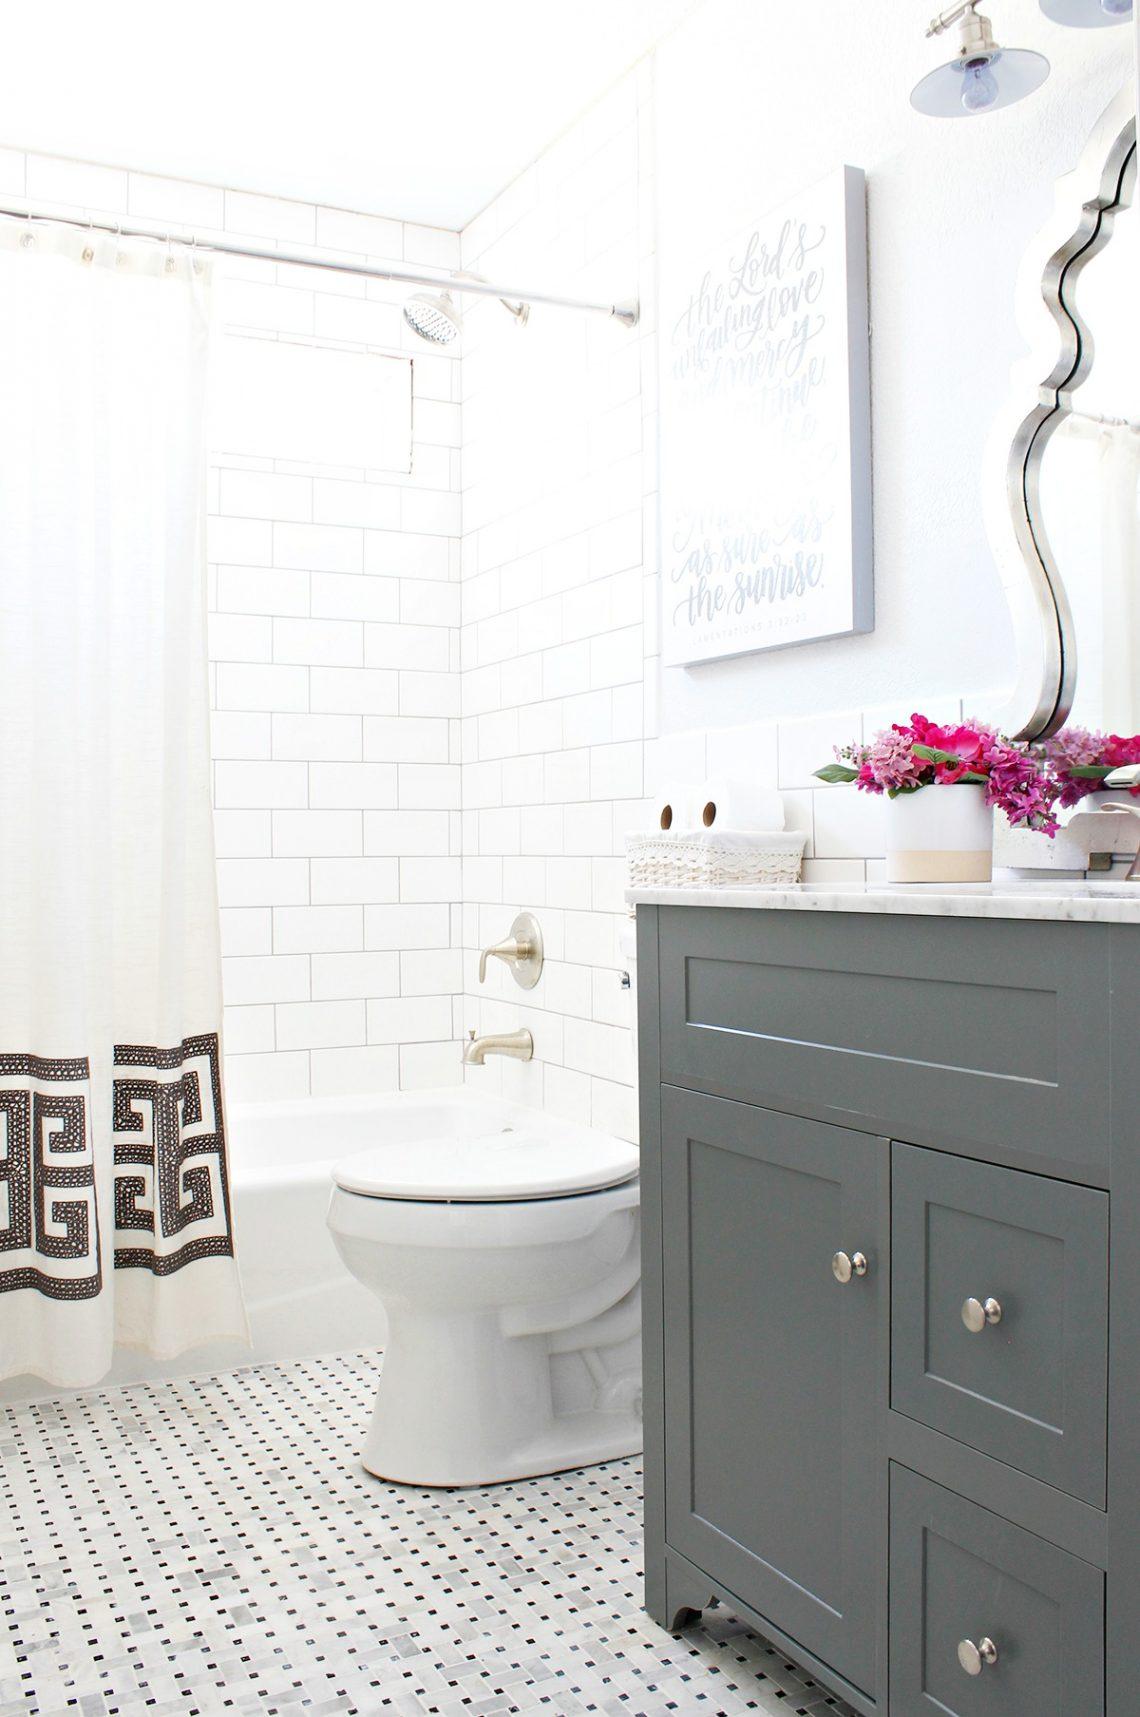 Pfister bathroom faucets reviews - Prescott View Home Reno Kids Bathroom Reno Reveal Pfister Faucet Review